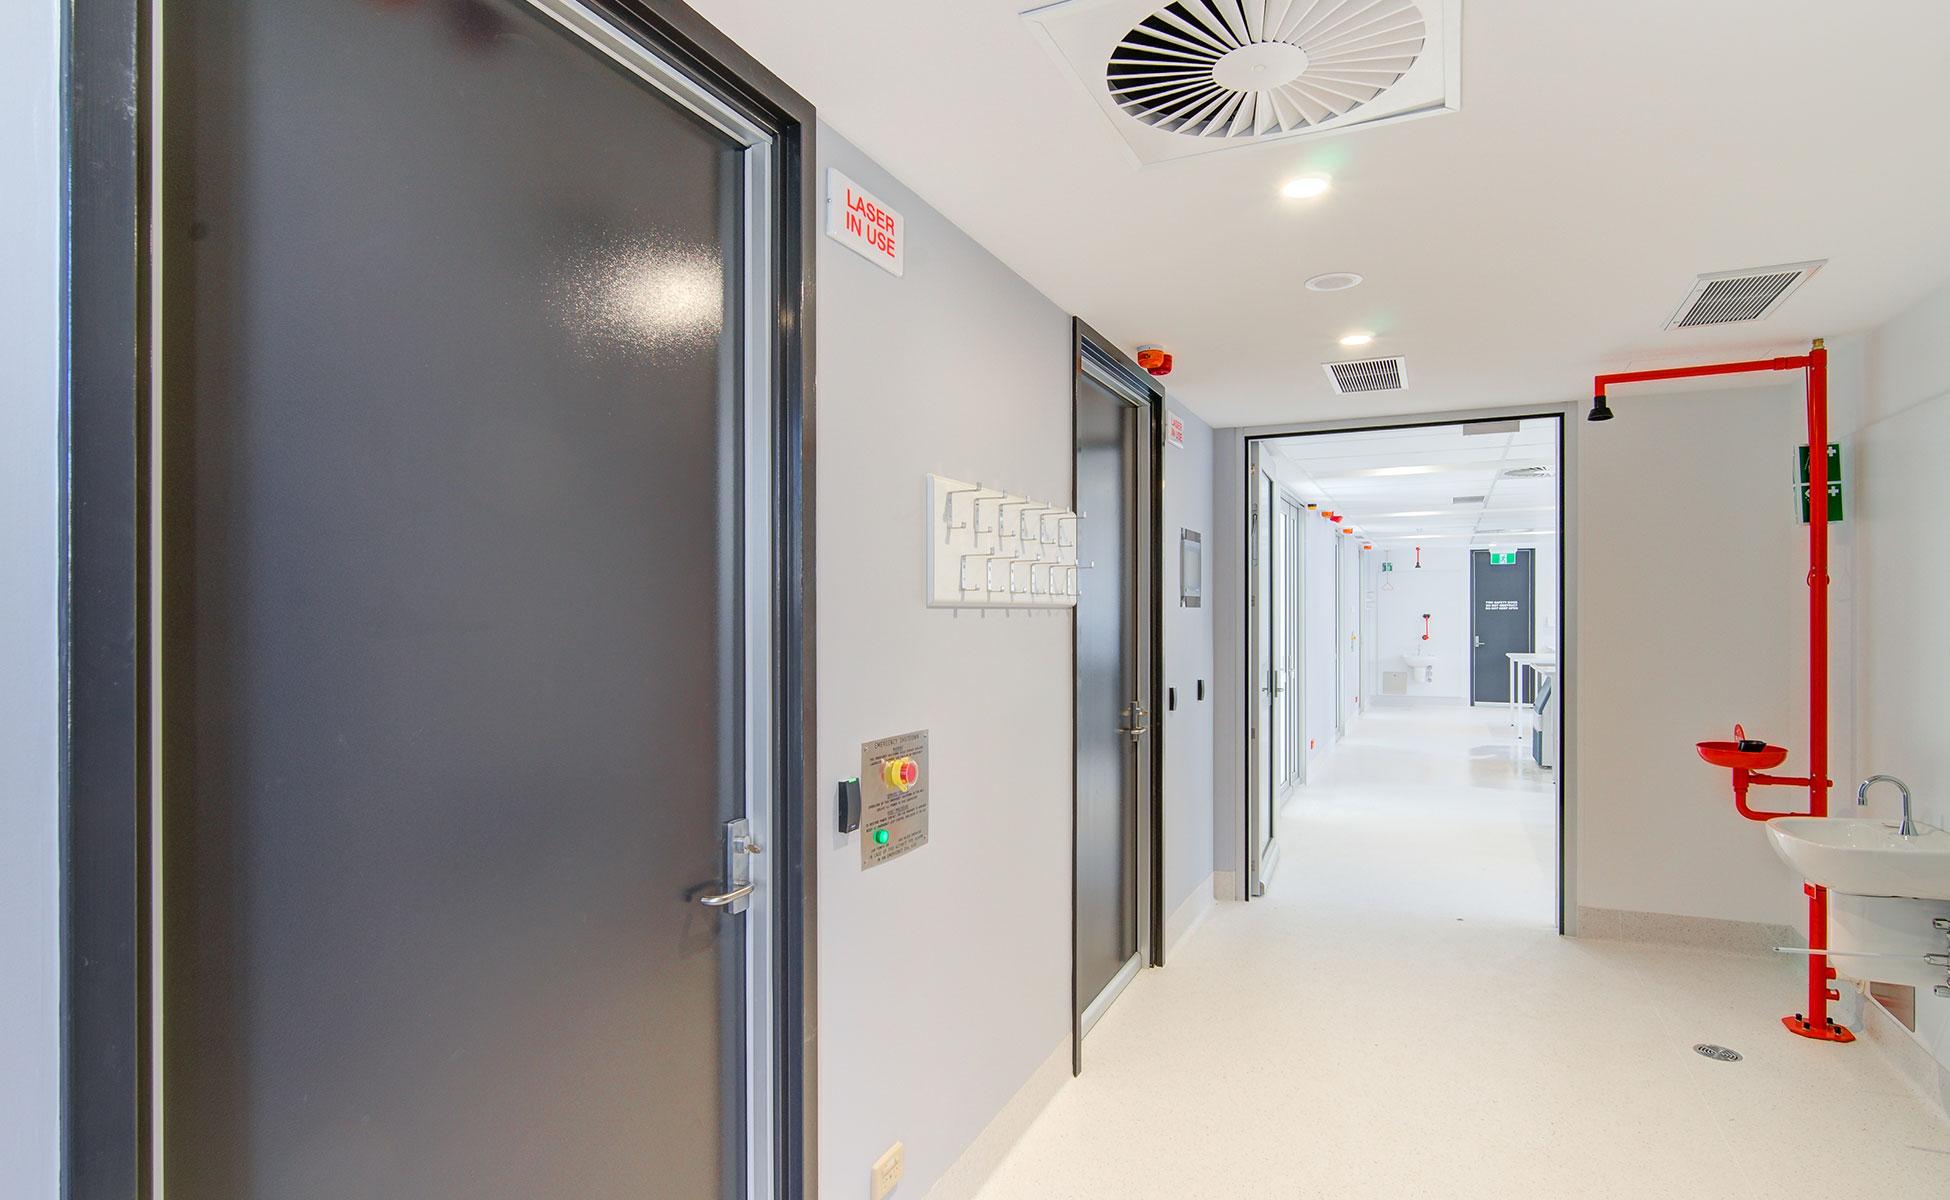 UQ Ritchie Building PC2 Laboratory